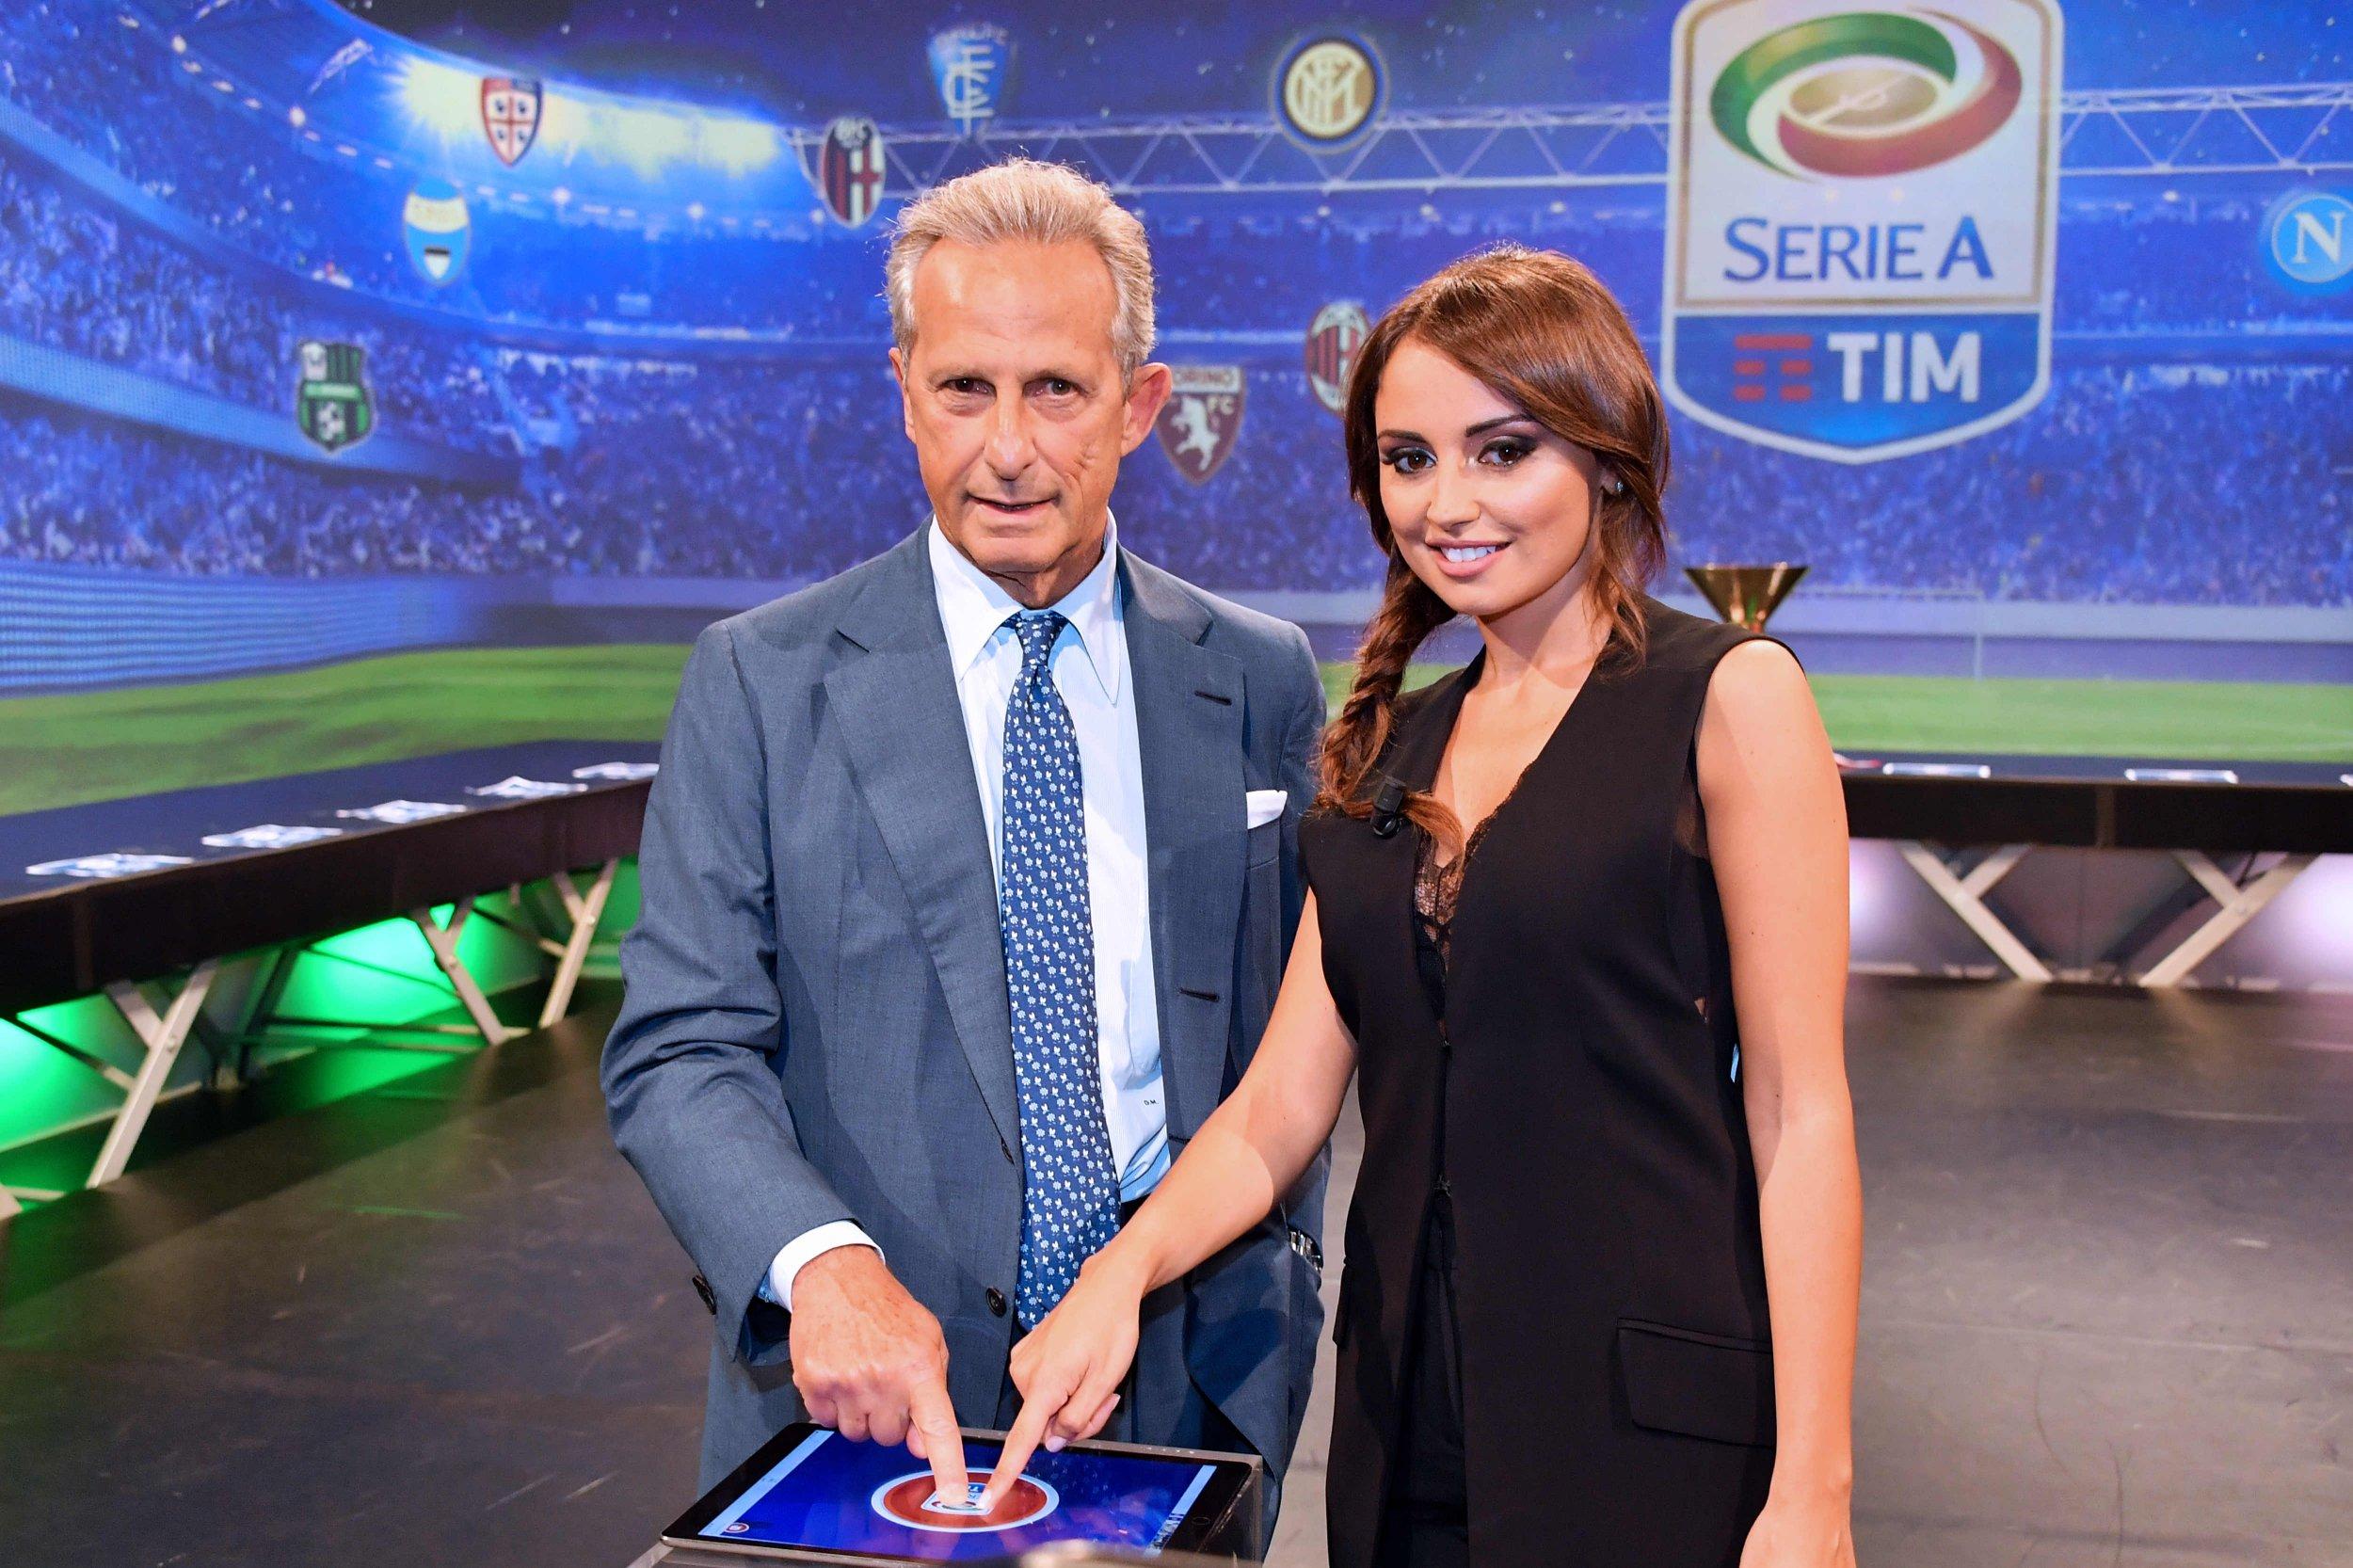 Calendario Serie A 2019 - 2020, in diretta su Sky Sport - #SkyCalendarioA